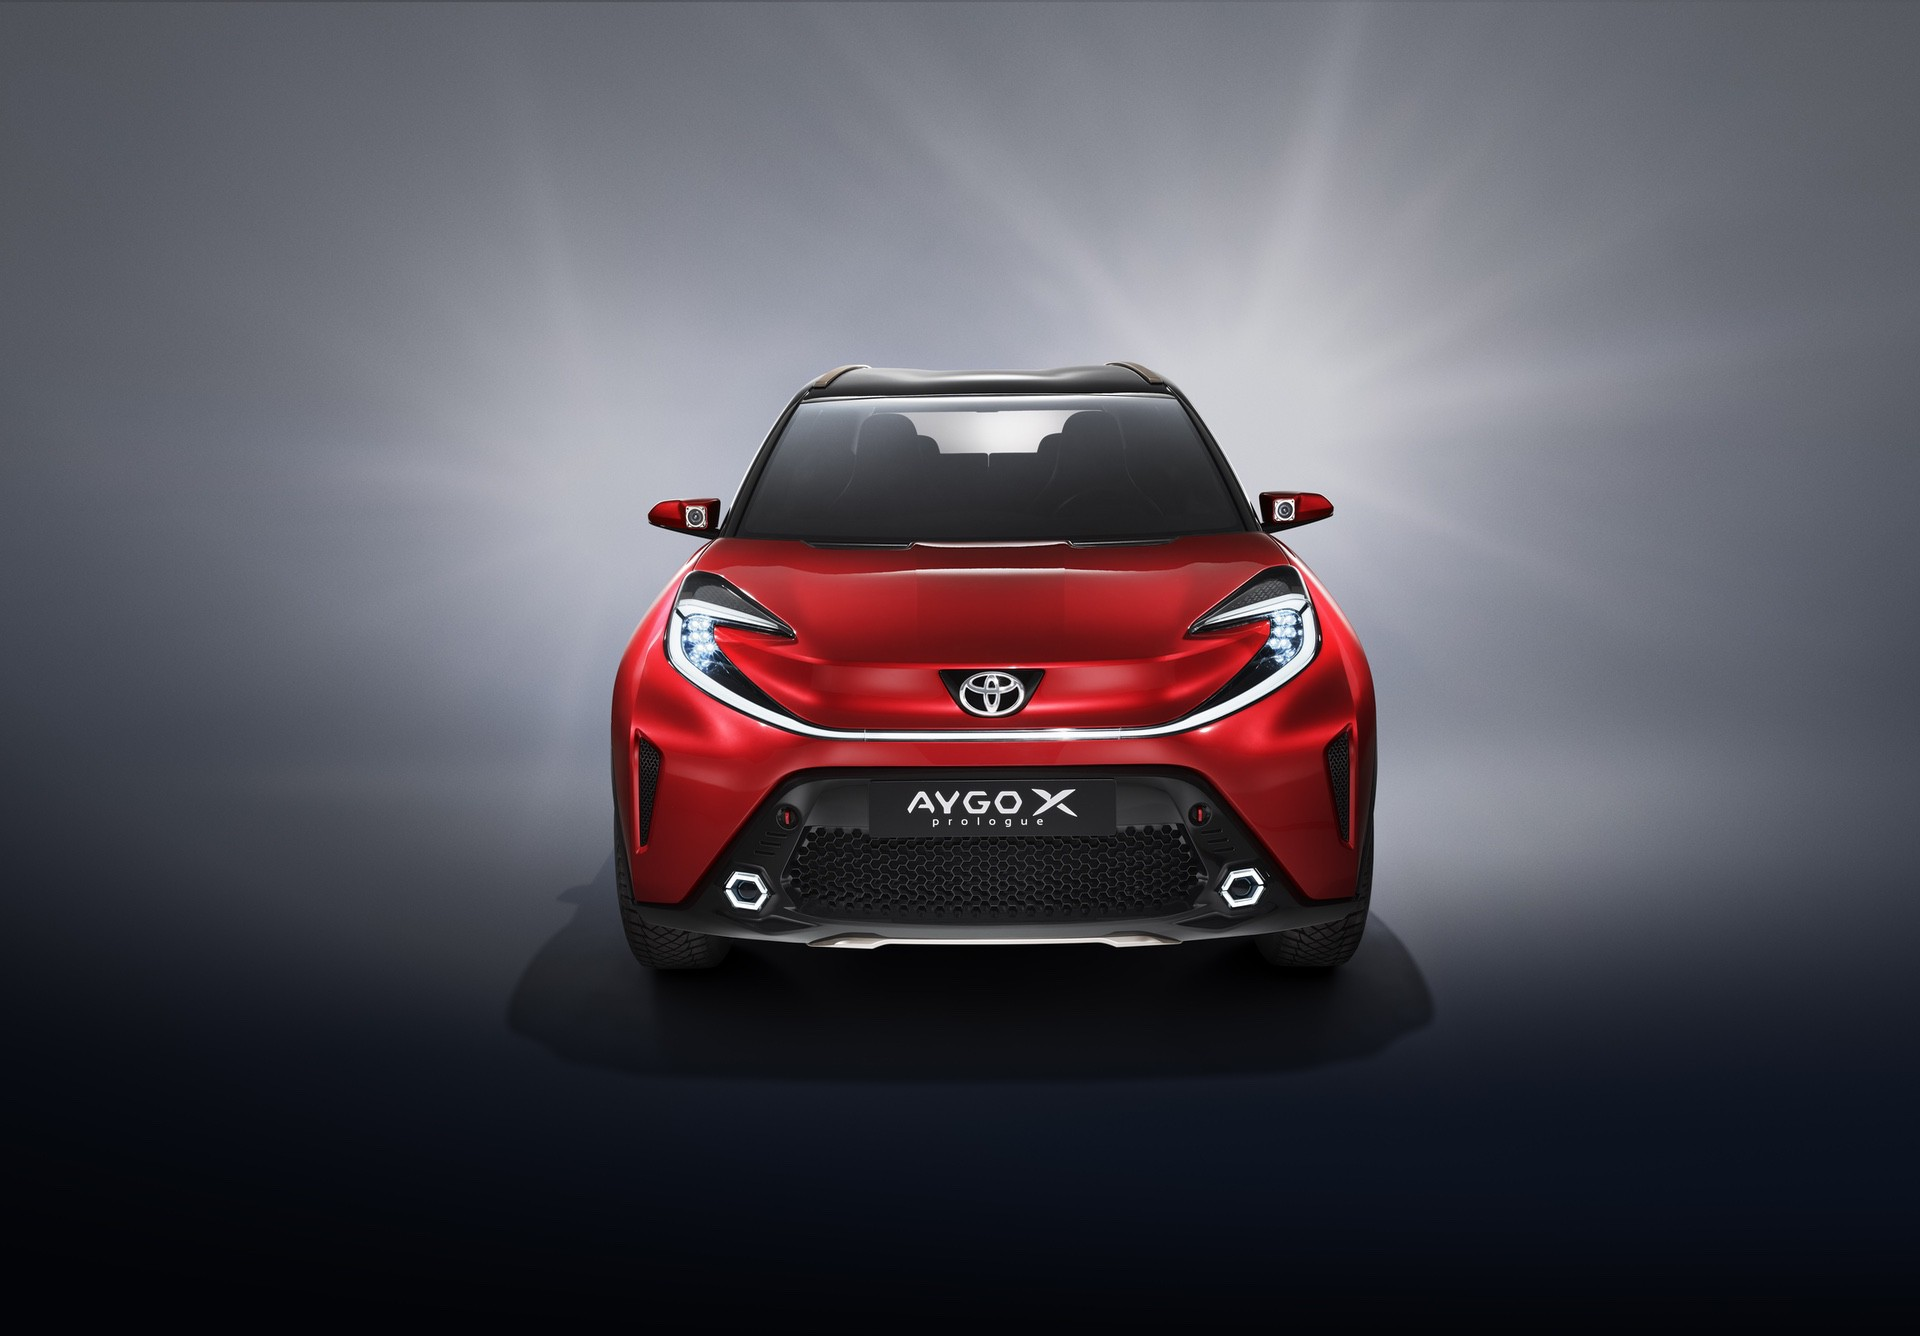 Toyota_Aygo_X_prologue-0024